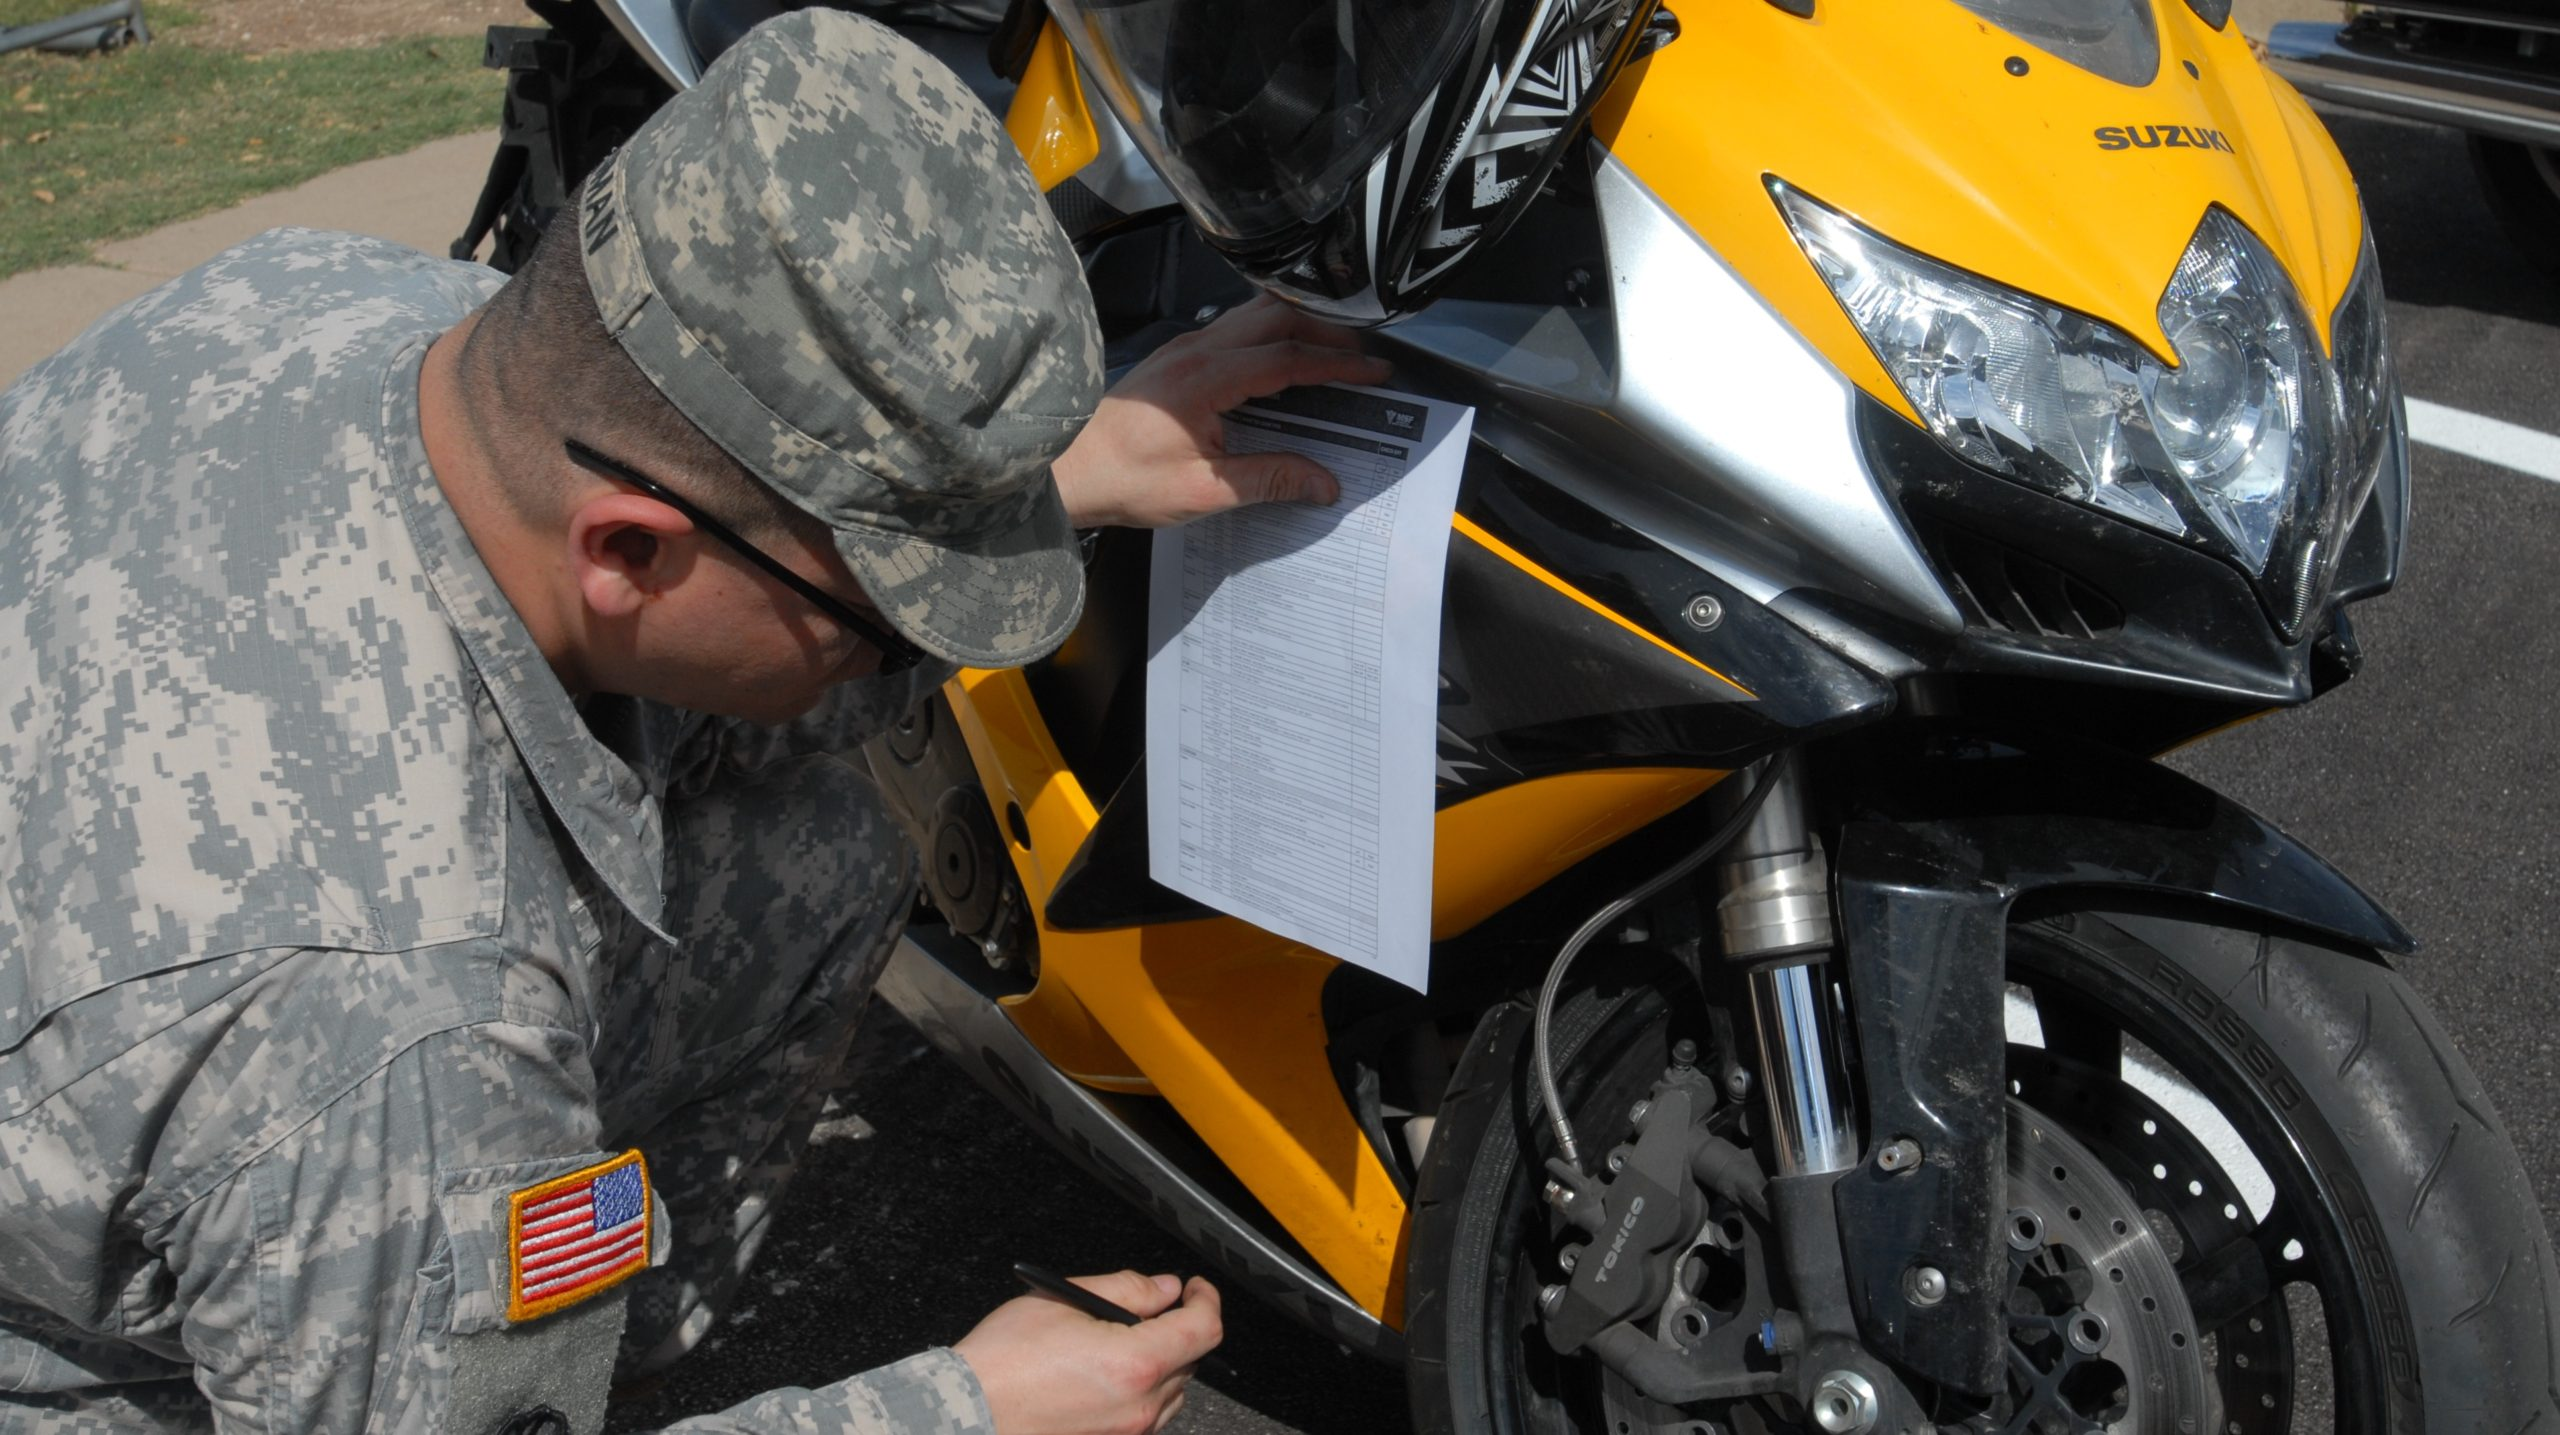 Motorcycle maintenance is key!